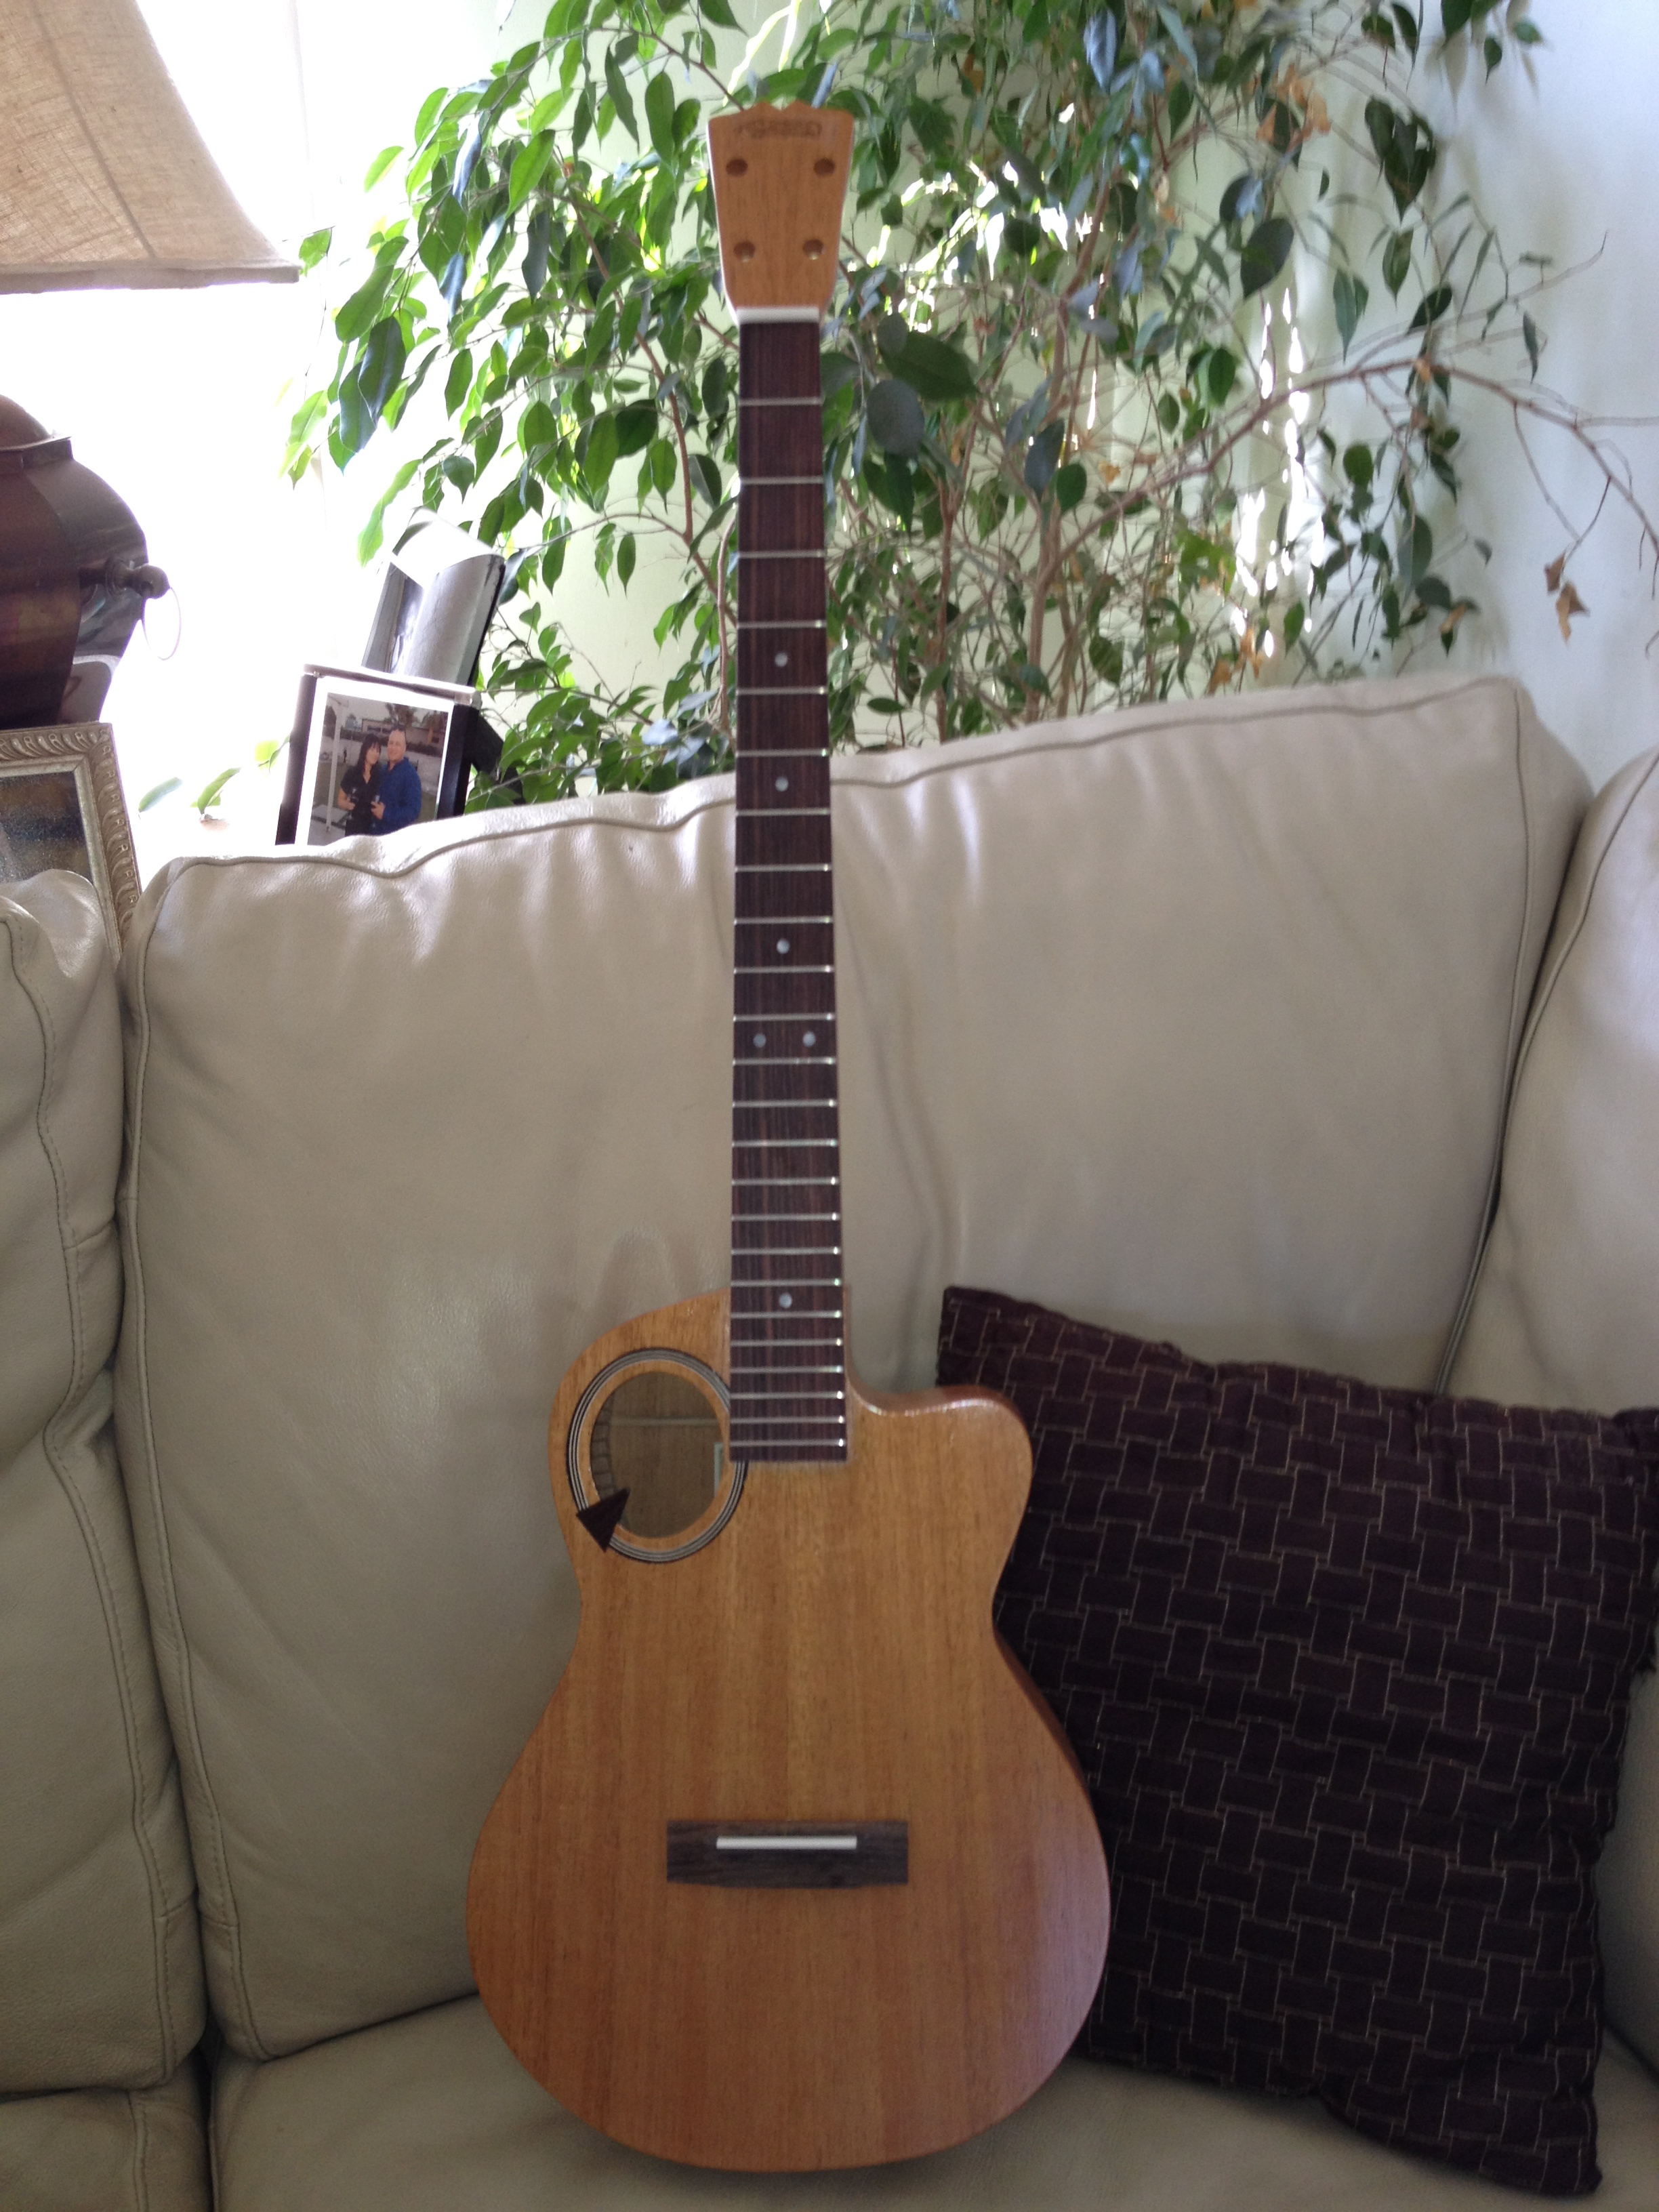 Q model custom XL stretch neck baritone ukuele